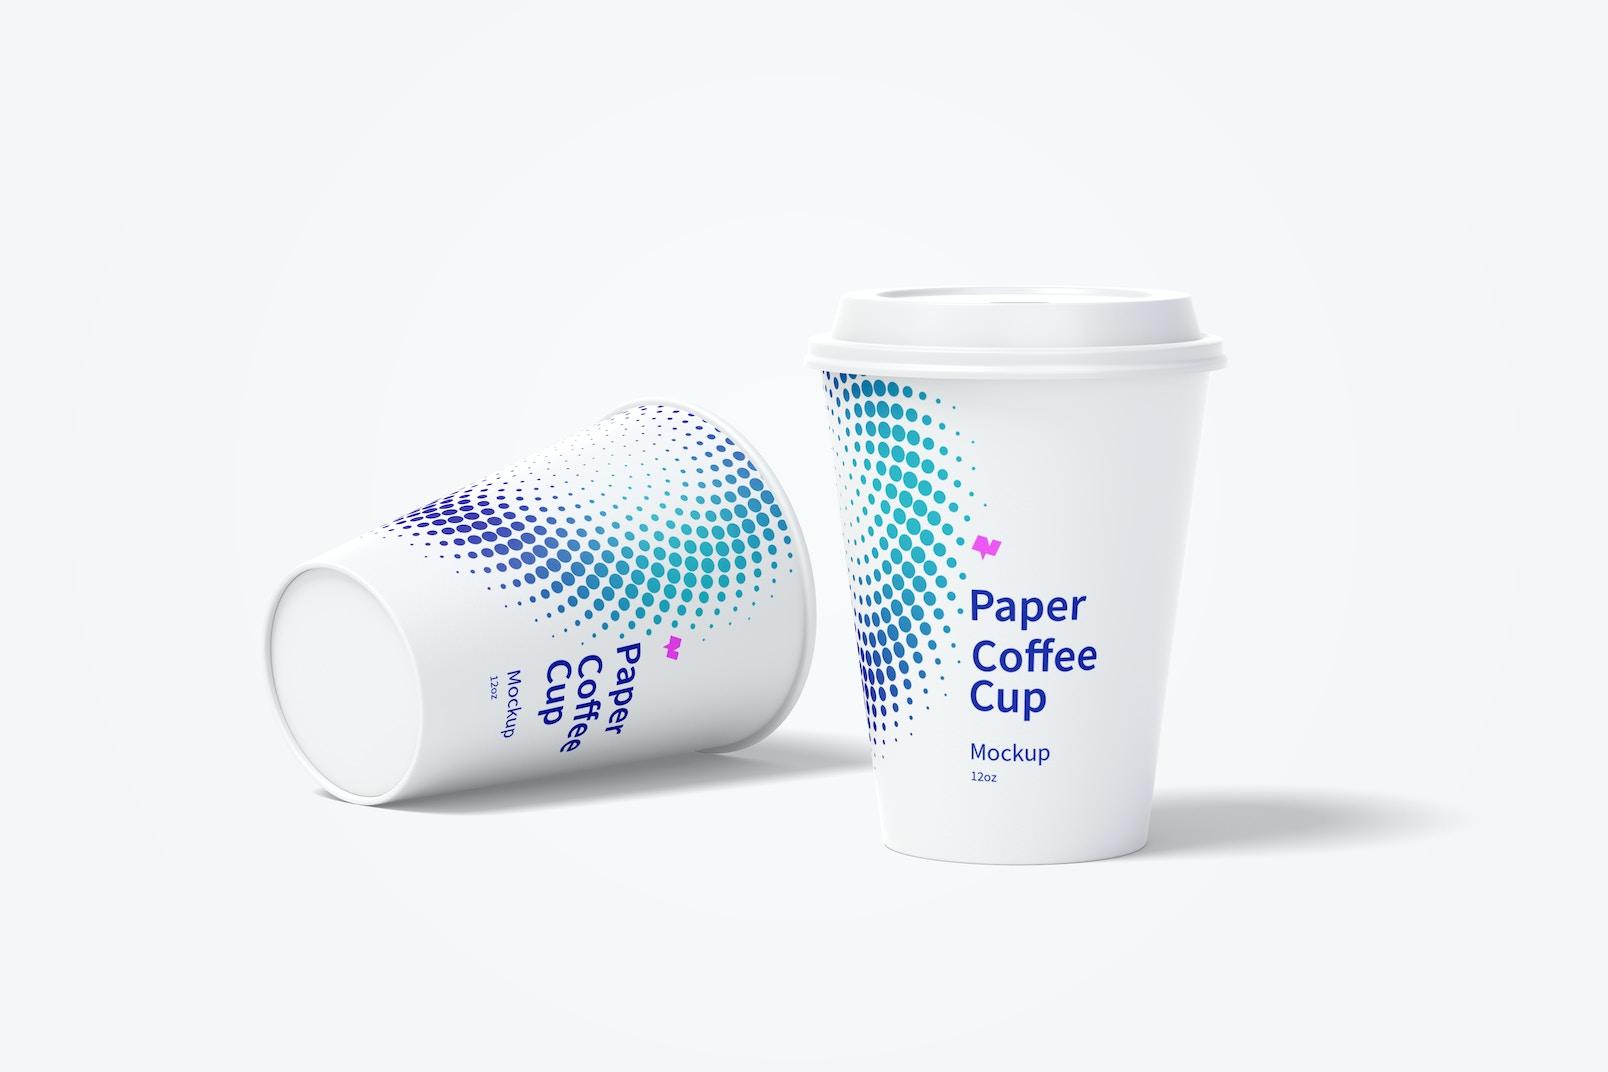 12oz Paper Coffee Cups Mockup